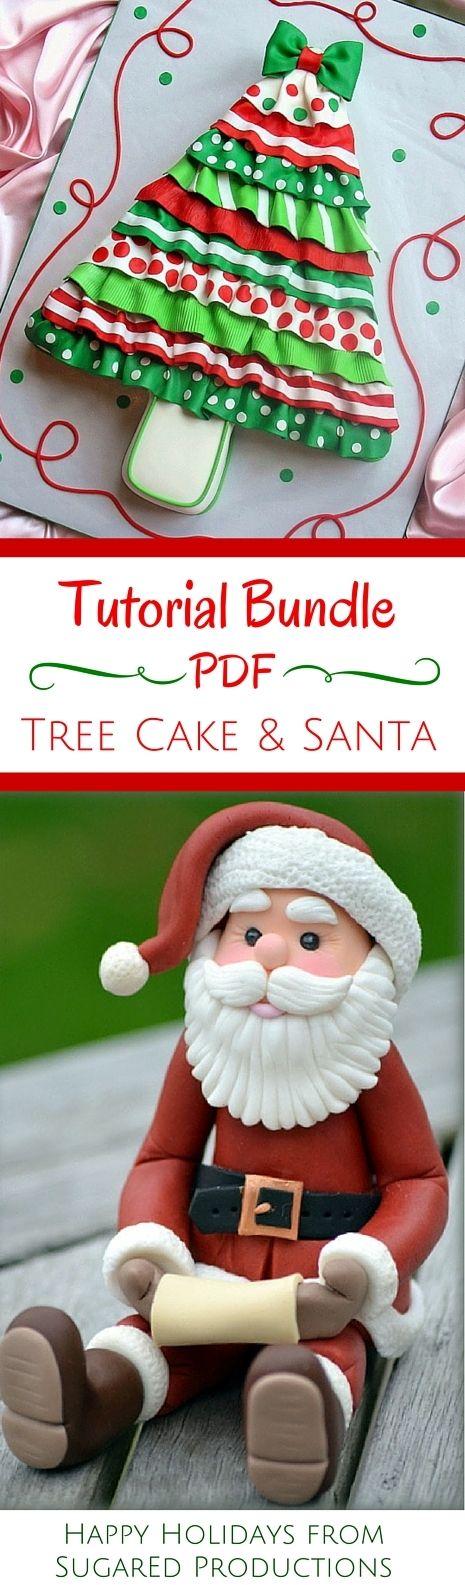 Free HolidayTutorial PDF Bundle - Ruffled Tree Cake and Santa Figure